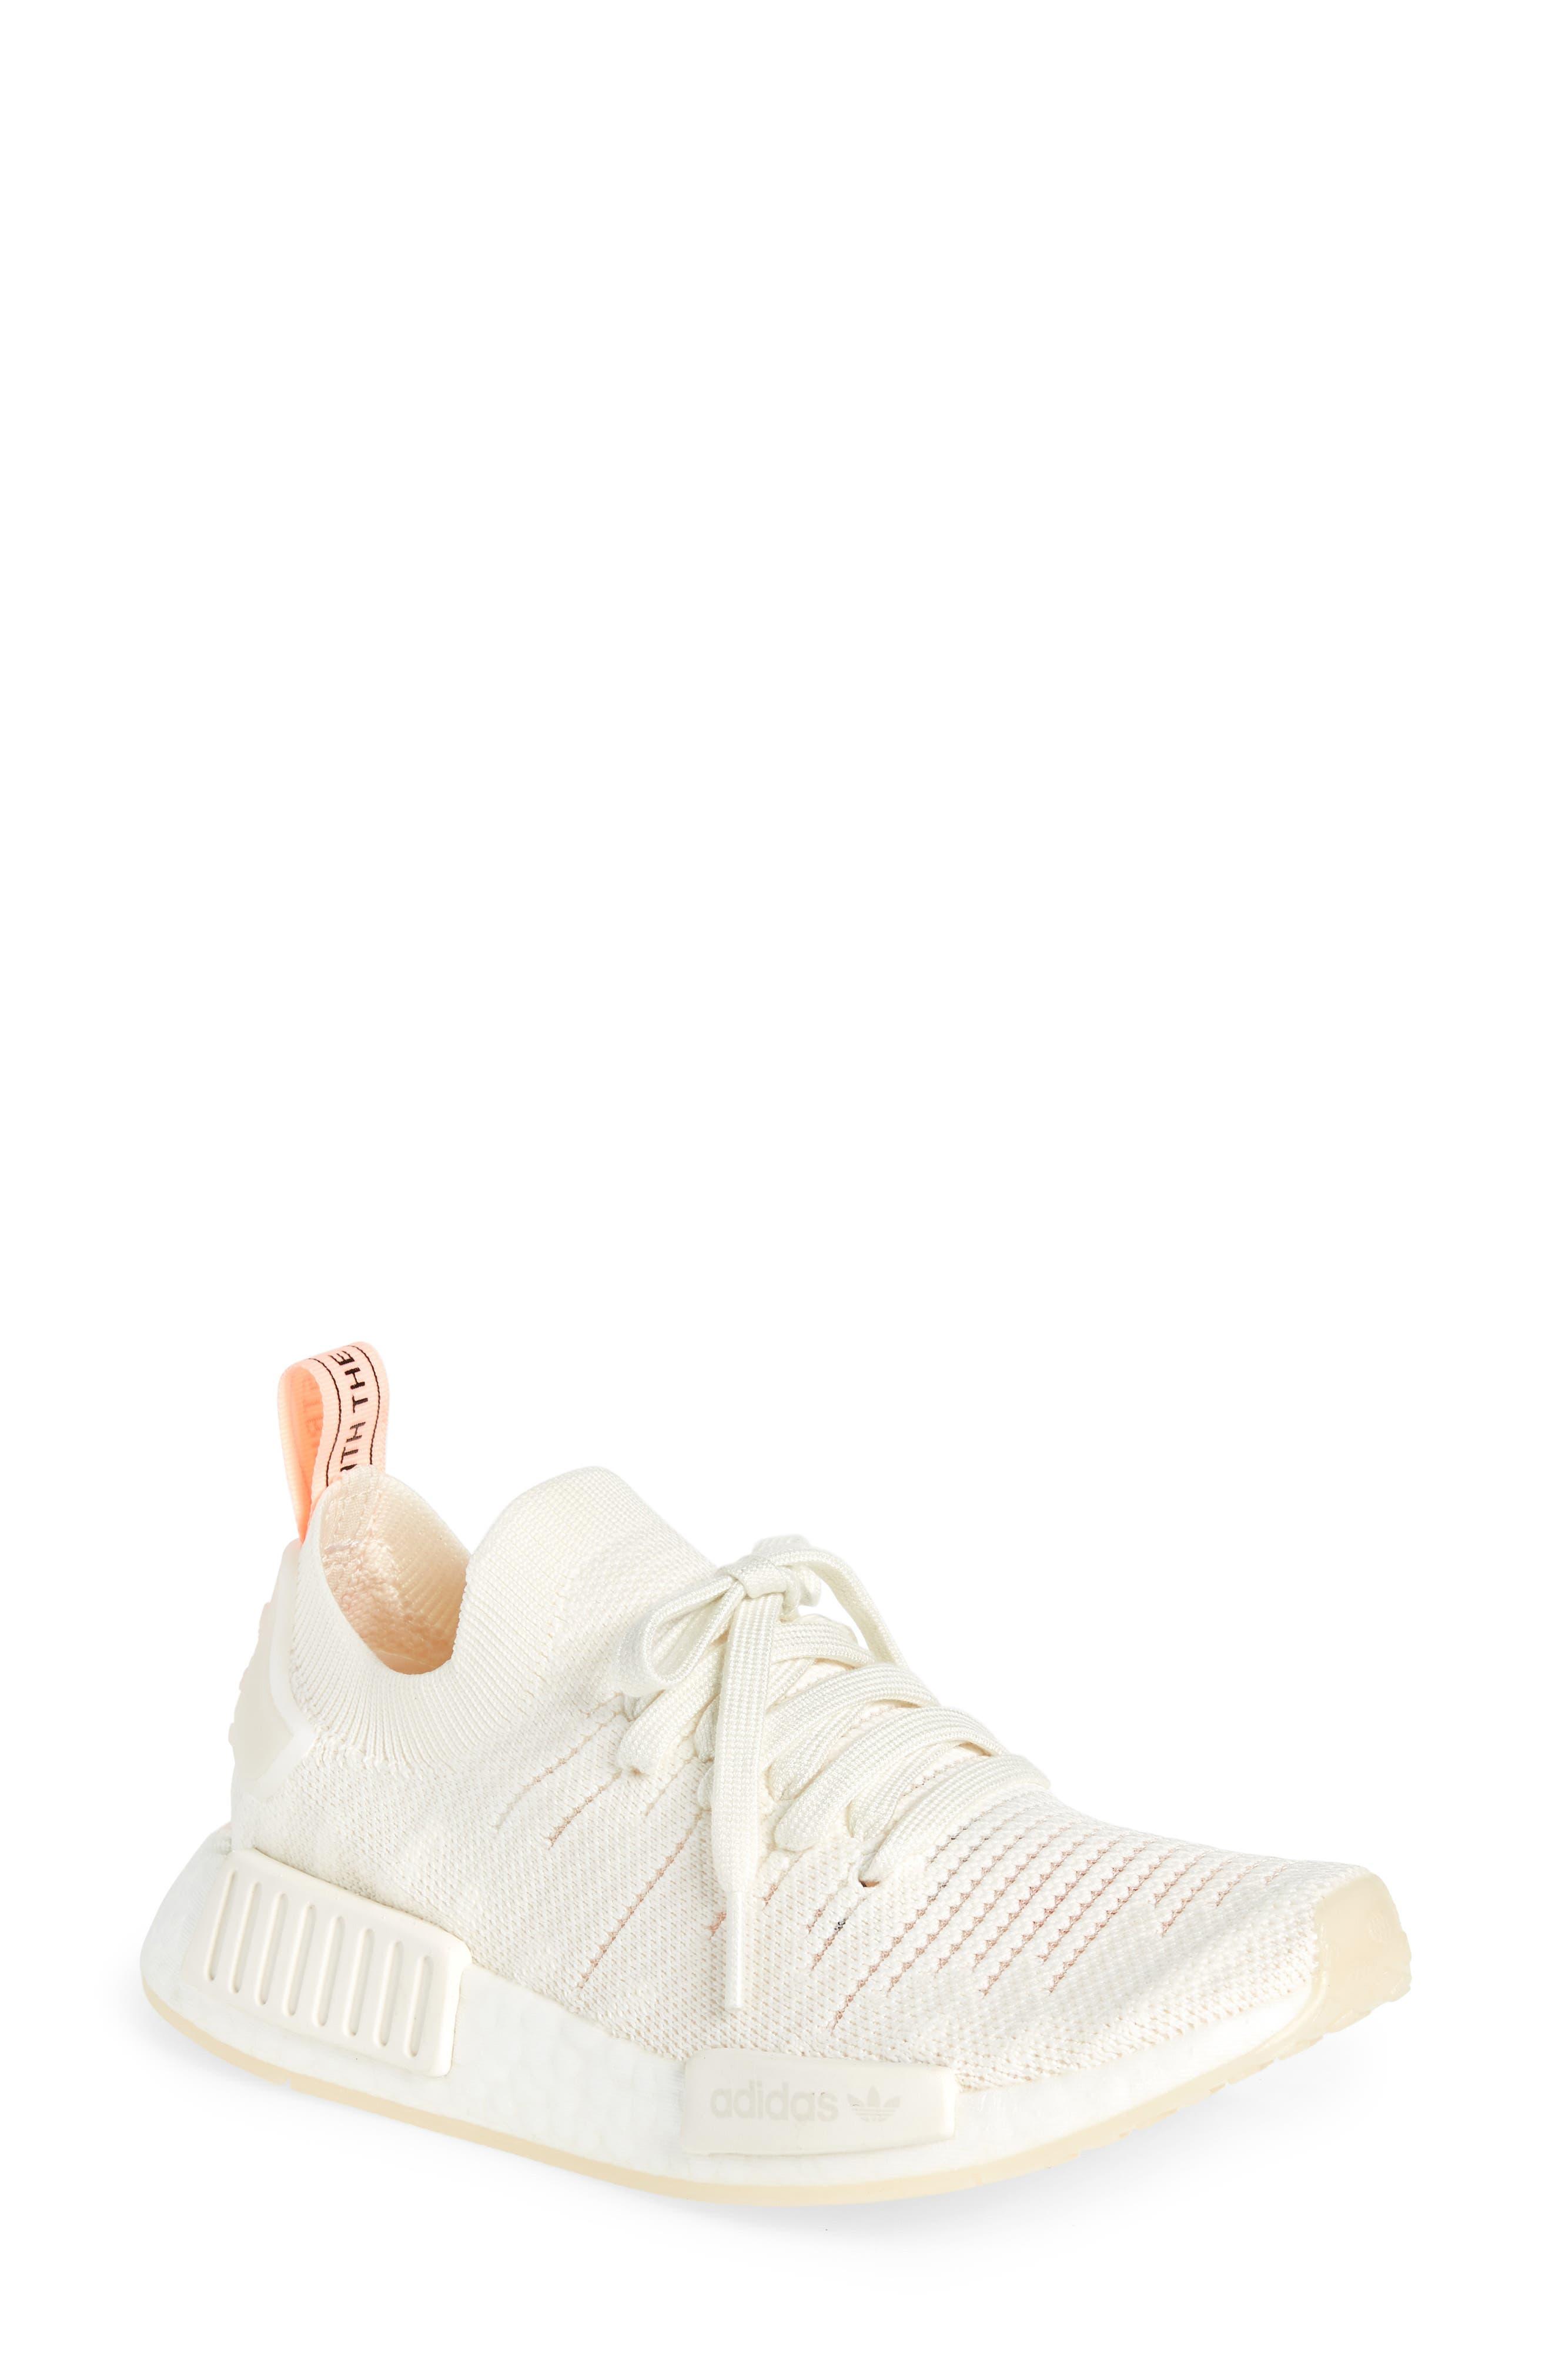 nmd_r1 stlt primeknit shoes womens white